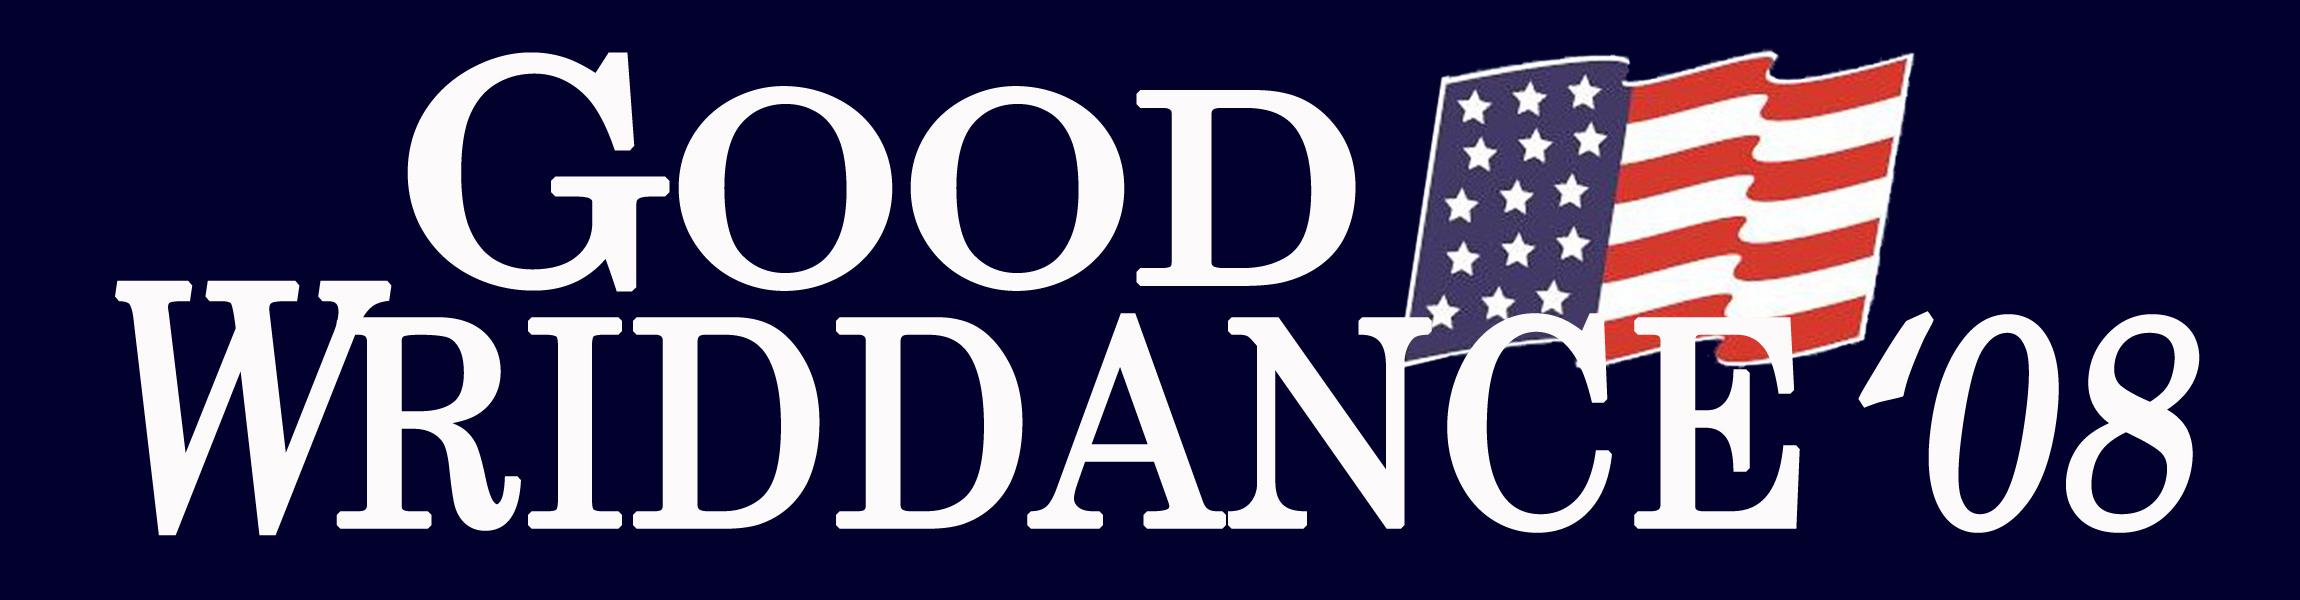 Good Wriddance!